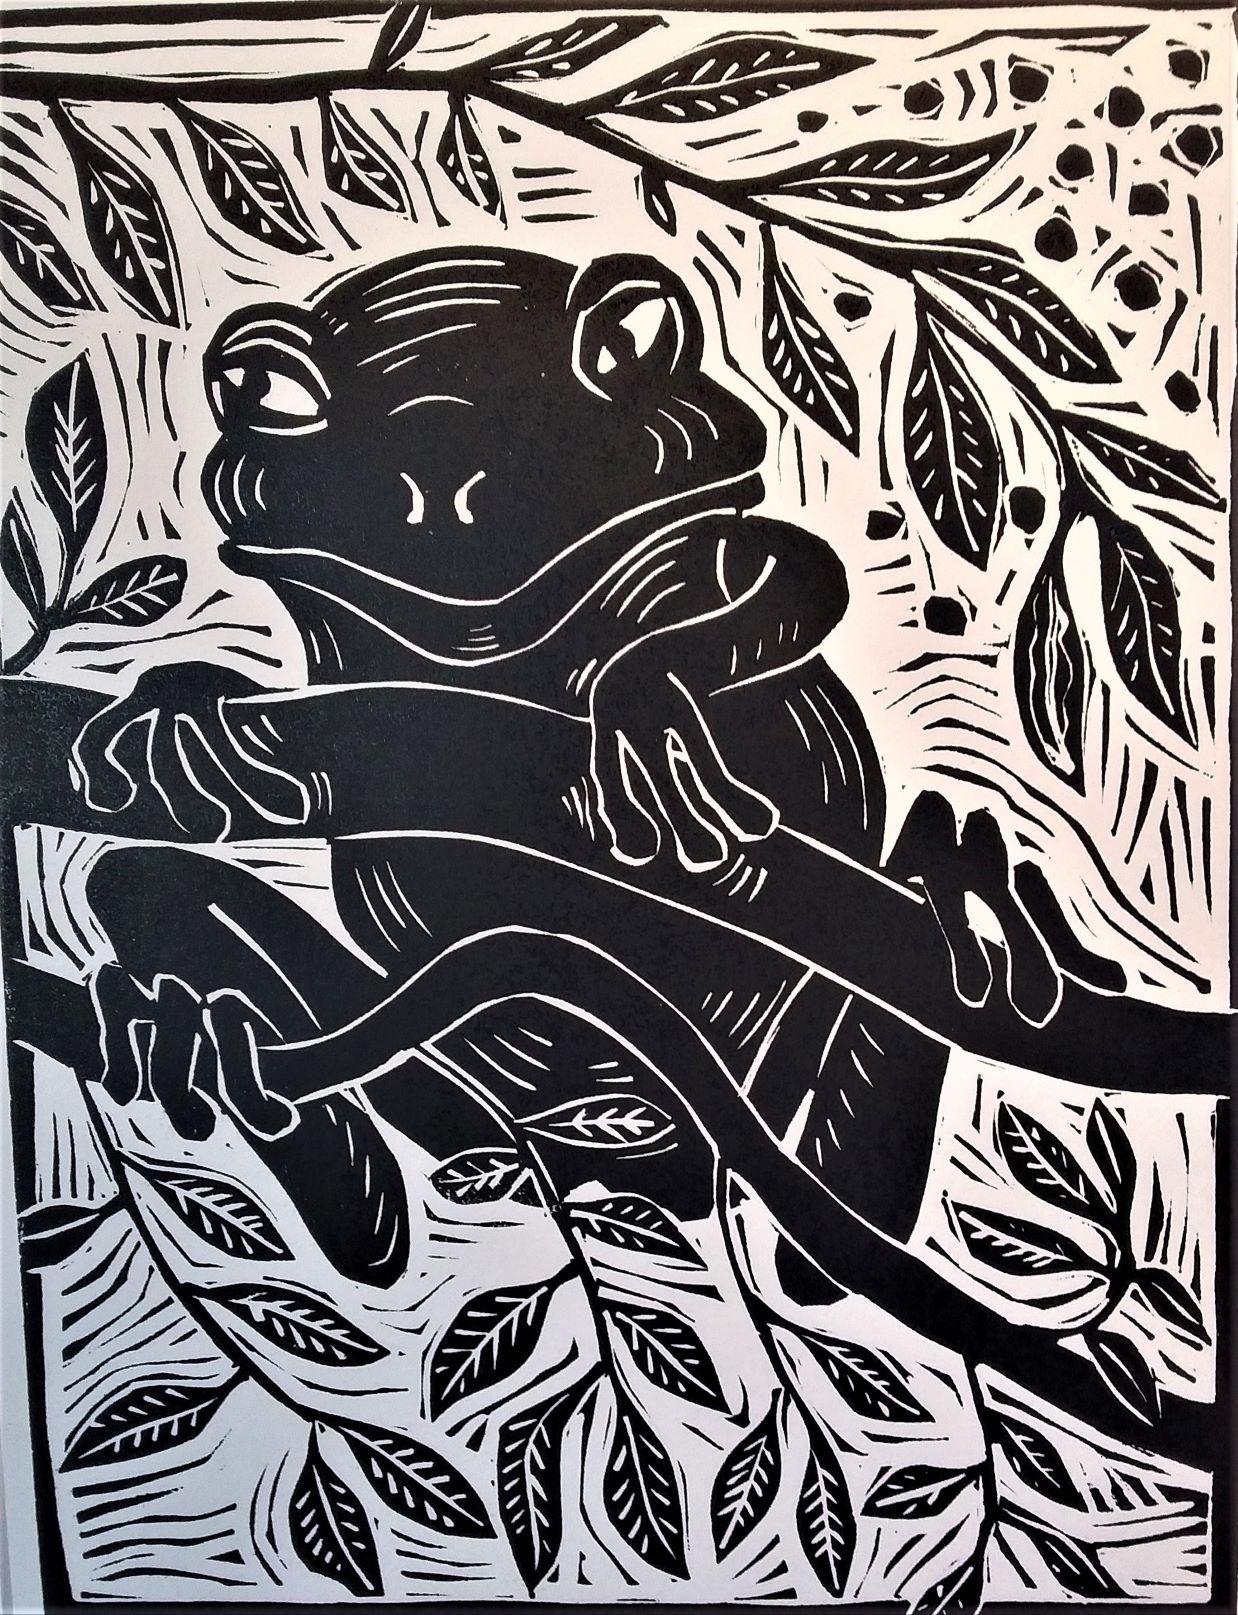 Tree frog_linoprint_Jim Woodbury.jpg